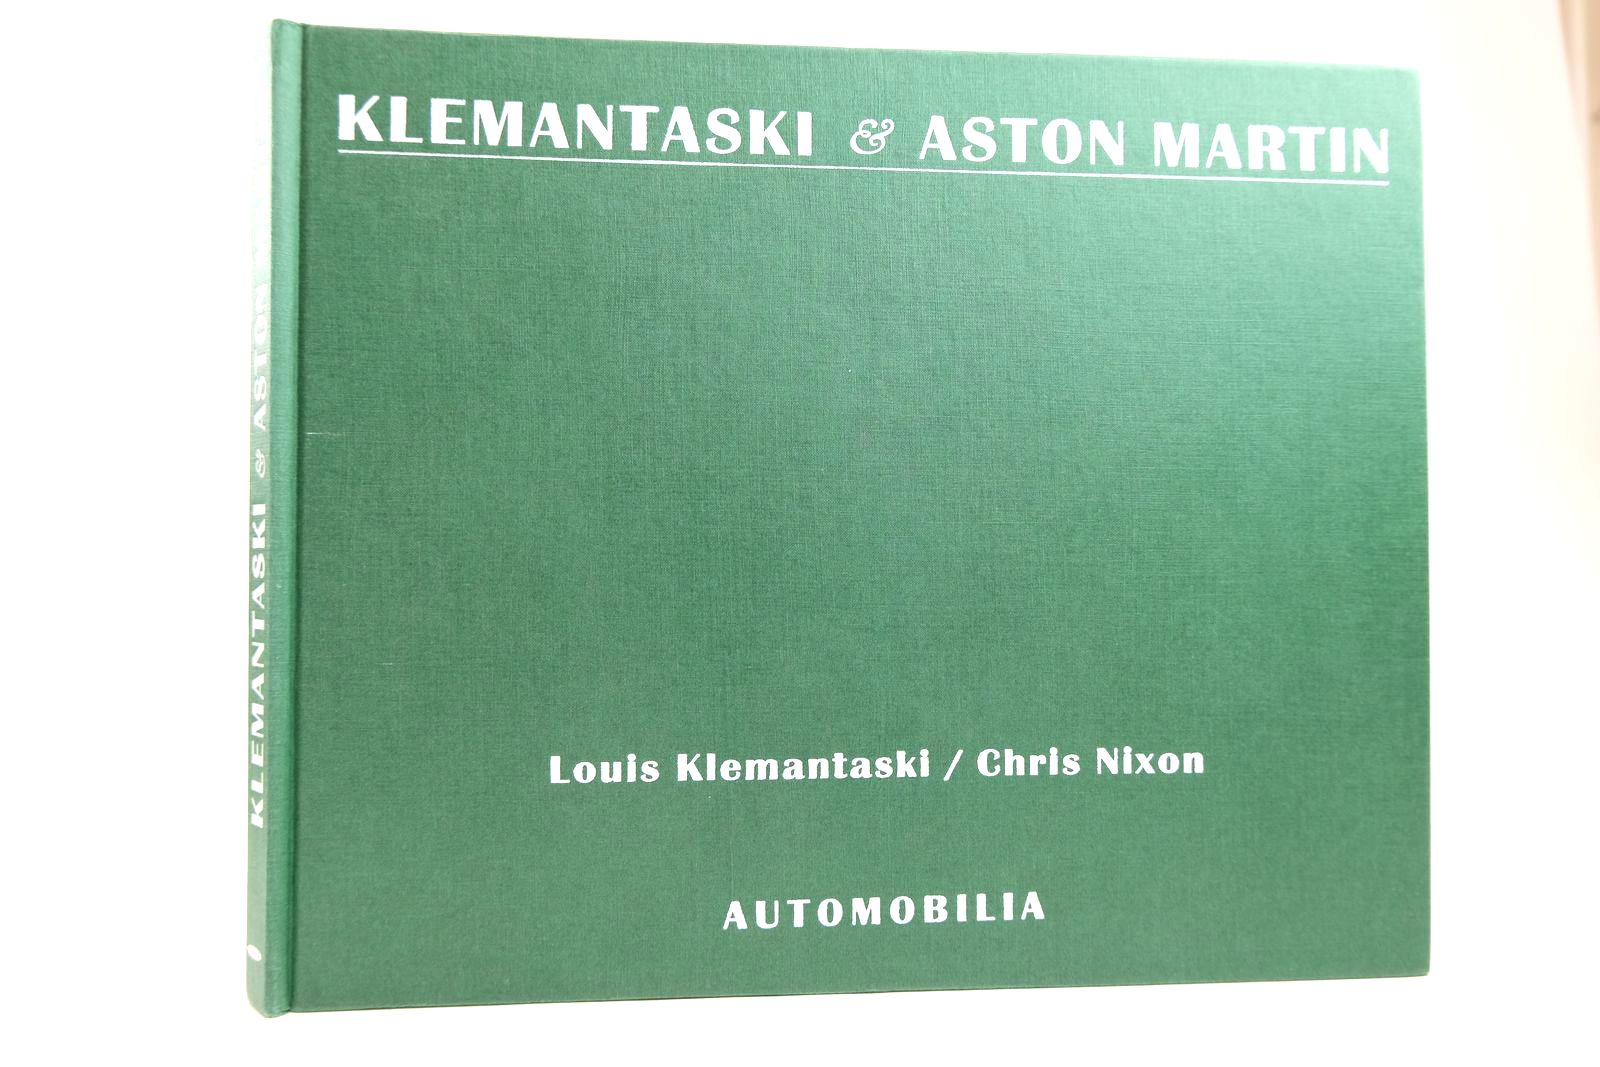 Photo of KLEMANTASKI & ASTON MARTIN 1948-1959 written by Klemantaski, Louis Nixon, Chris published by Automobilia (STOCK CODE: 2131778)  for sale by Stella & Rose's Books